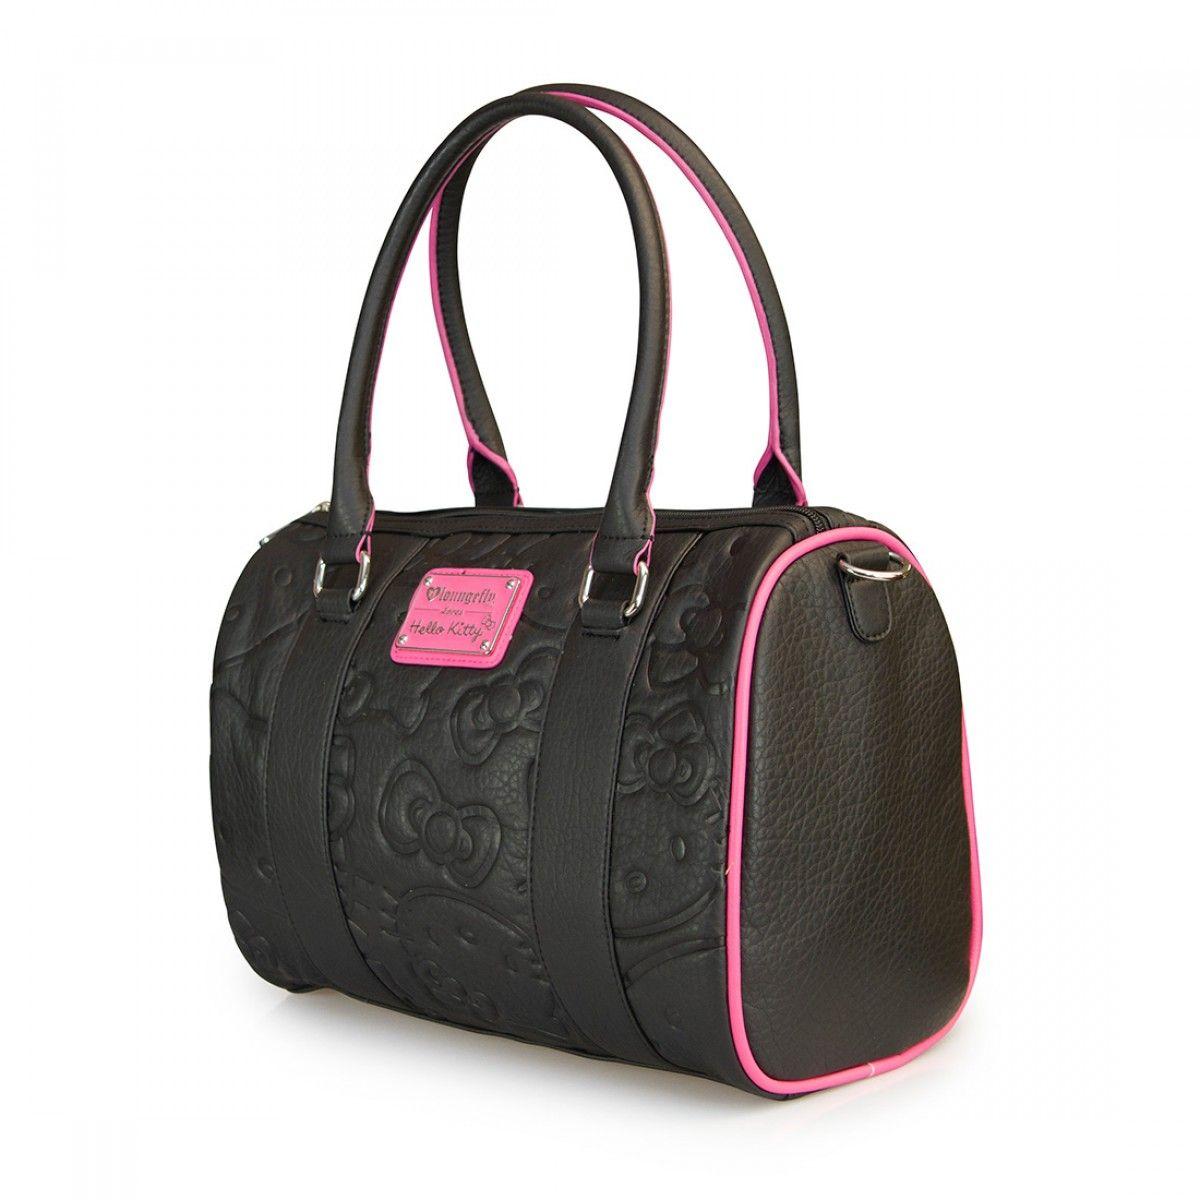 4c4401c8b0 Hello Kitty Black Pink Embossed Duffle Bag - Hello Kitty - Brands ...